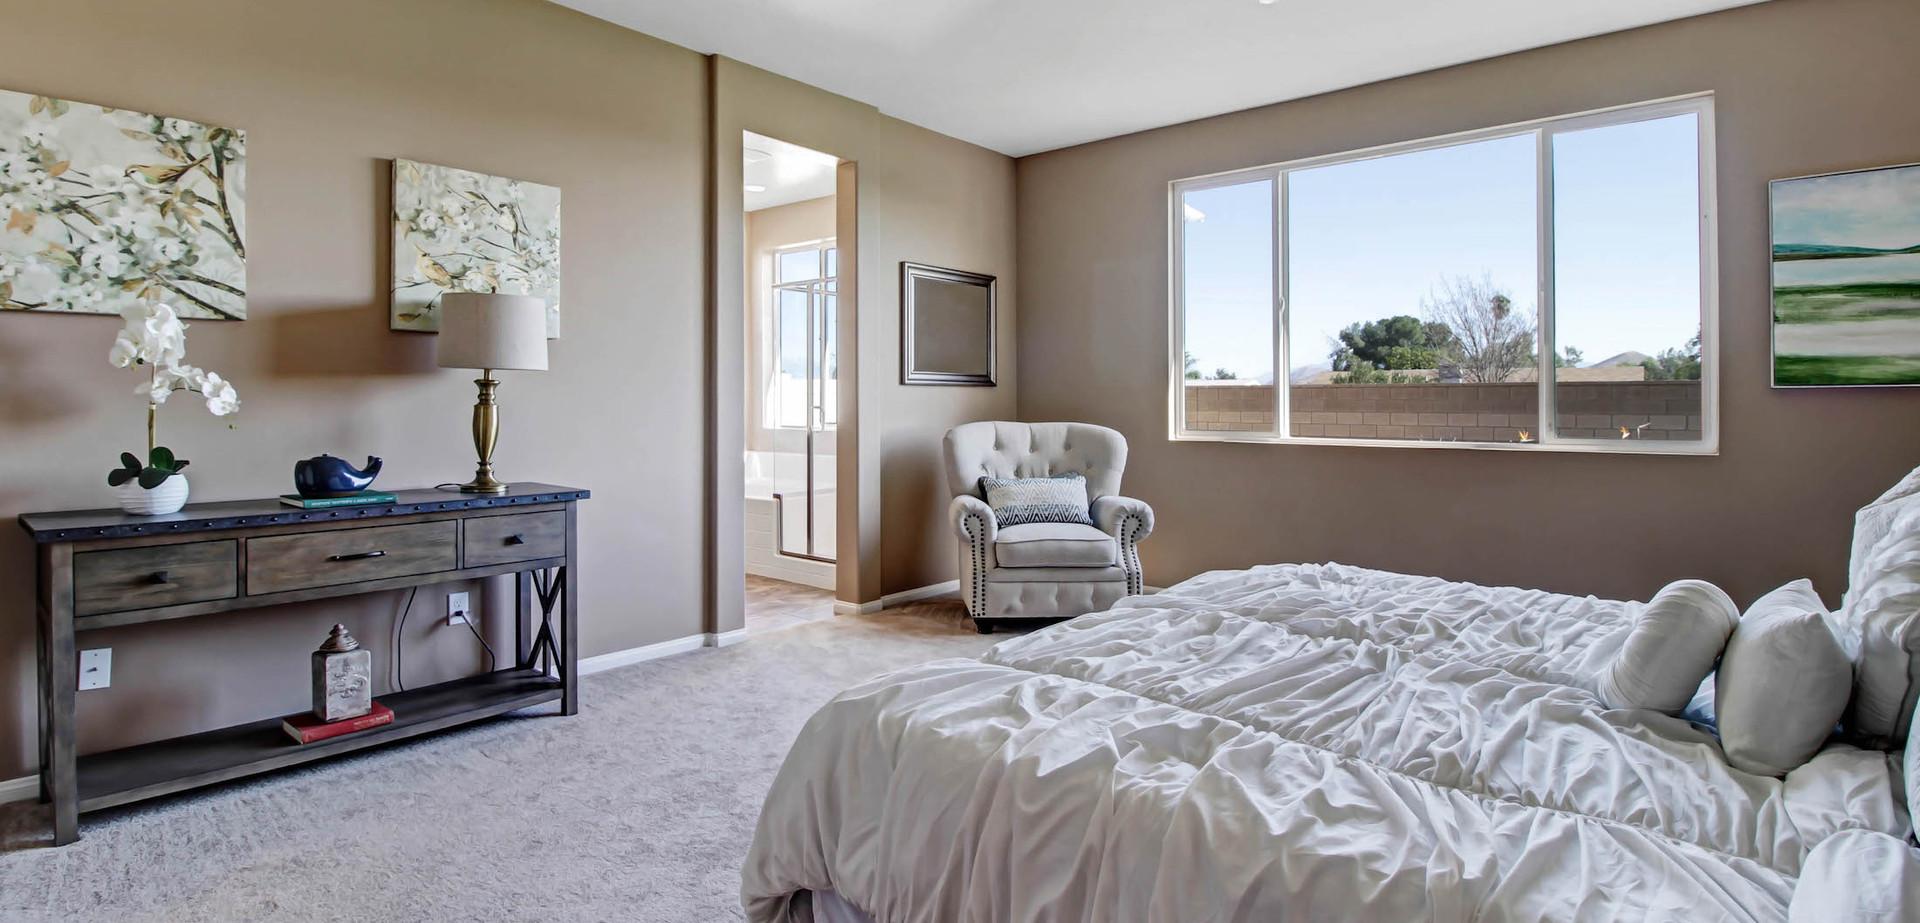 model-2 bedroom 2200x1125.jpg